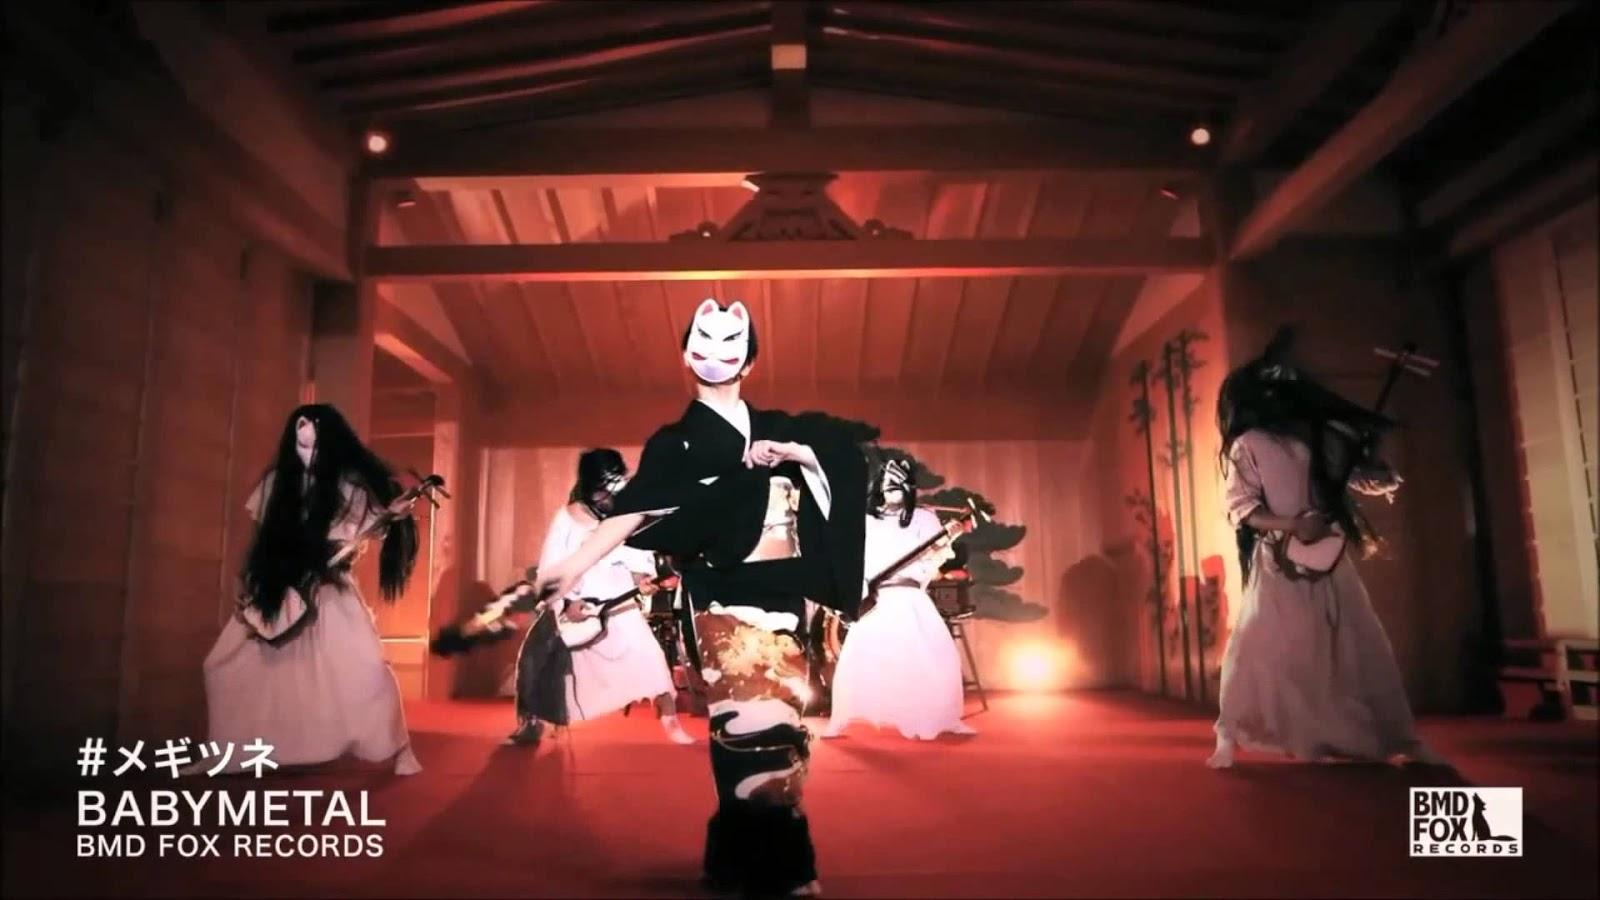 BabyMetal - Megitsune Official Music Video